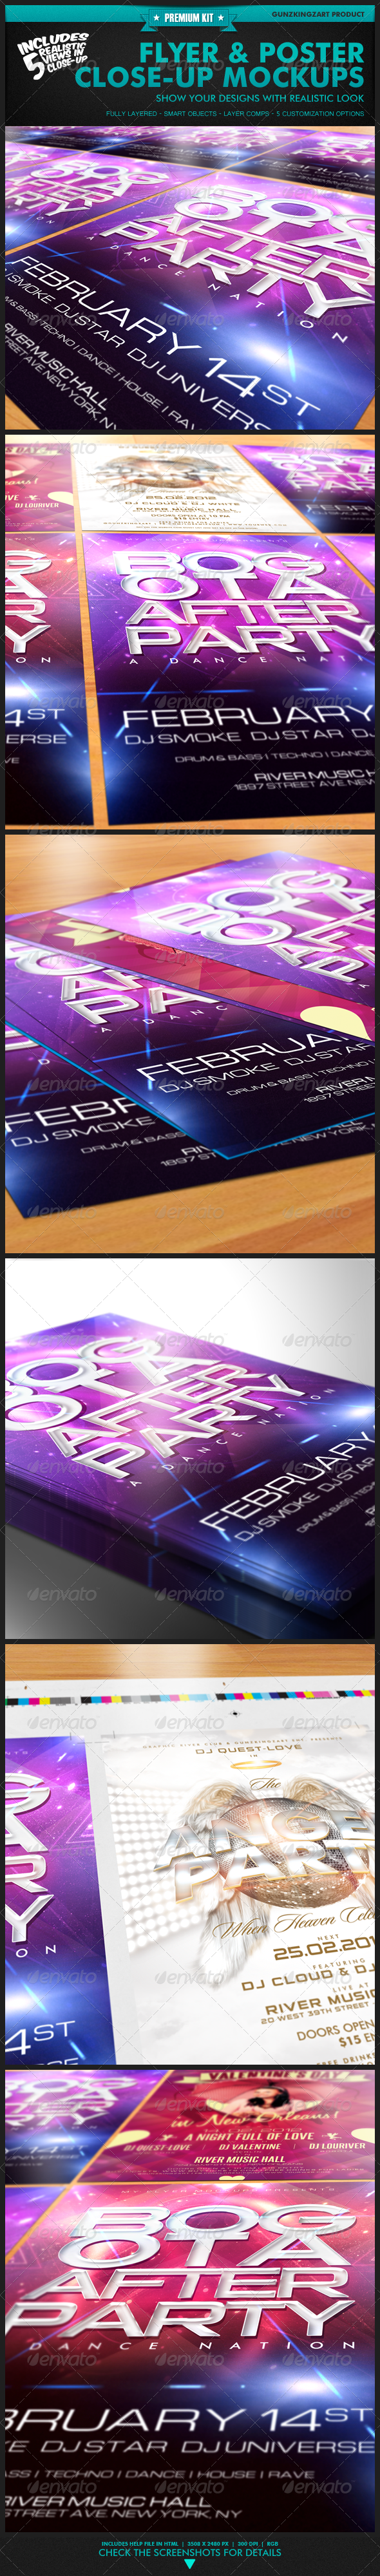 Graphic River Flyer & Poster Close-Up Mockups Premium Kit Graphics -  Product Mock-Ups 1495825